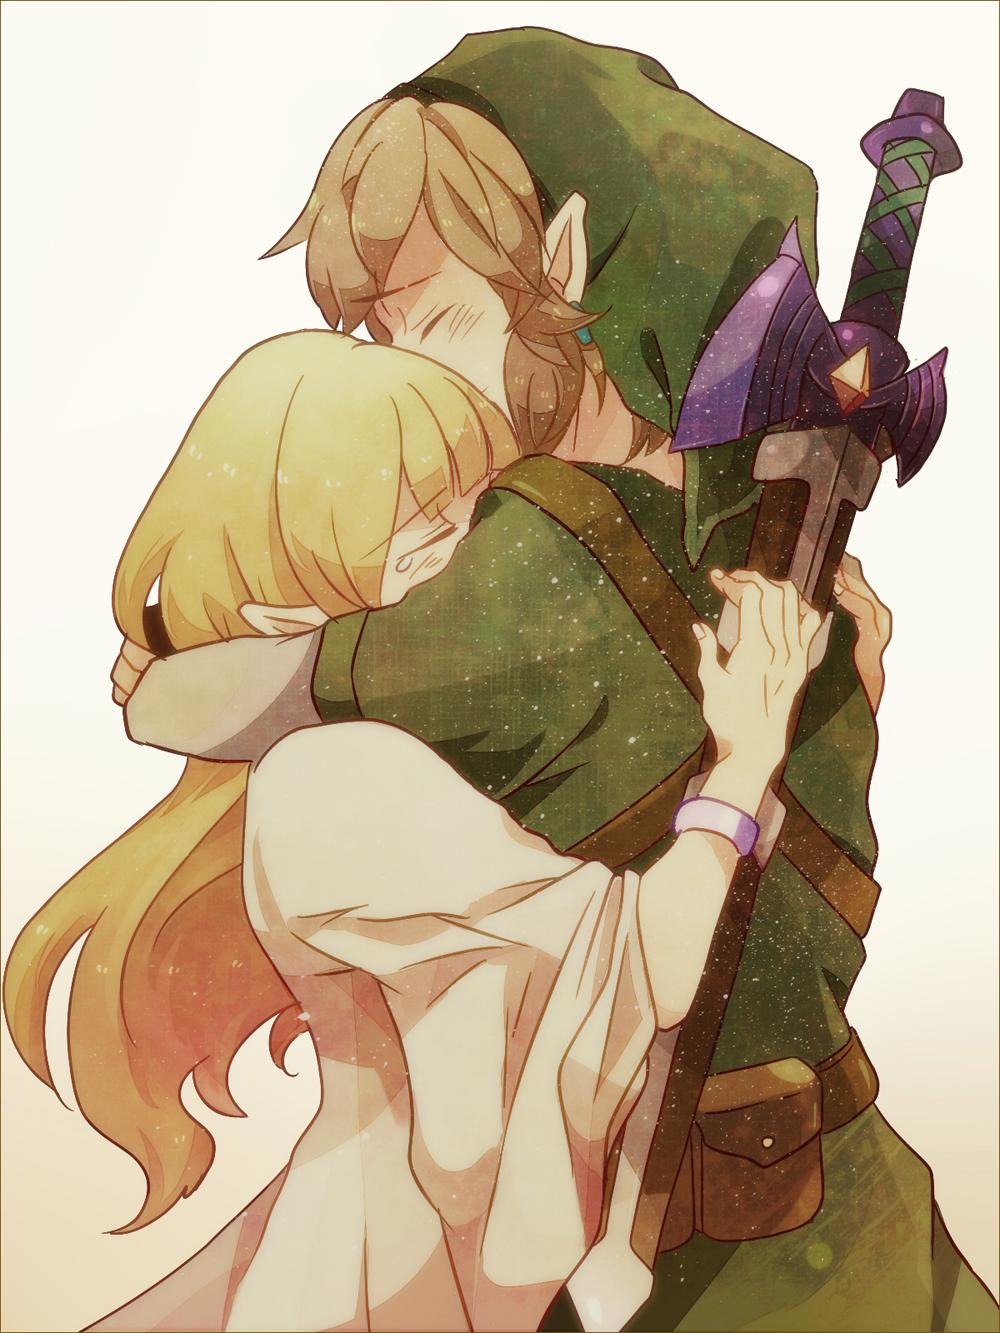 Link And Zelda Relationship Princess Zelda and Lin...